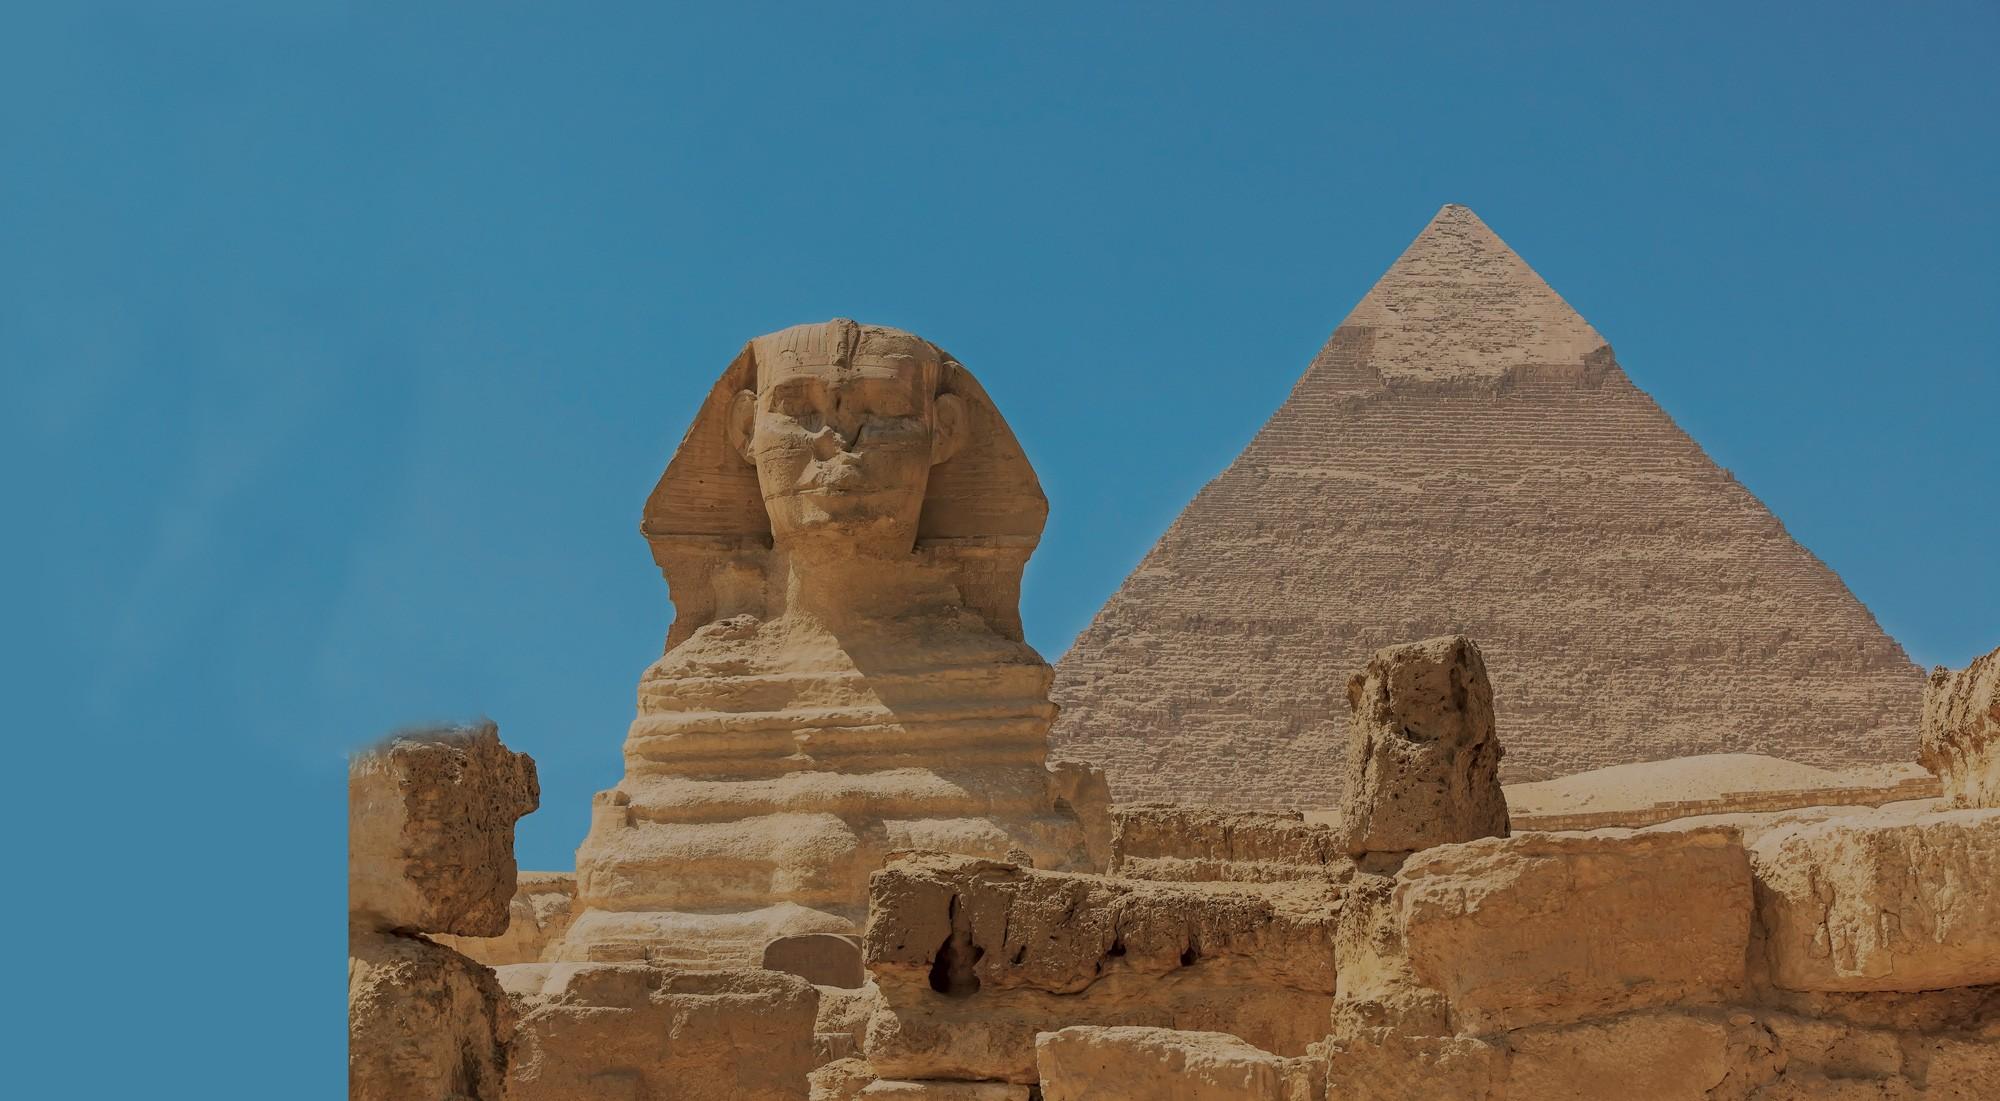 Giza Pyramids, Sphinx and Cairo Nile from Alexandria Port